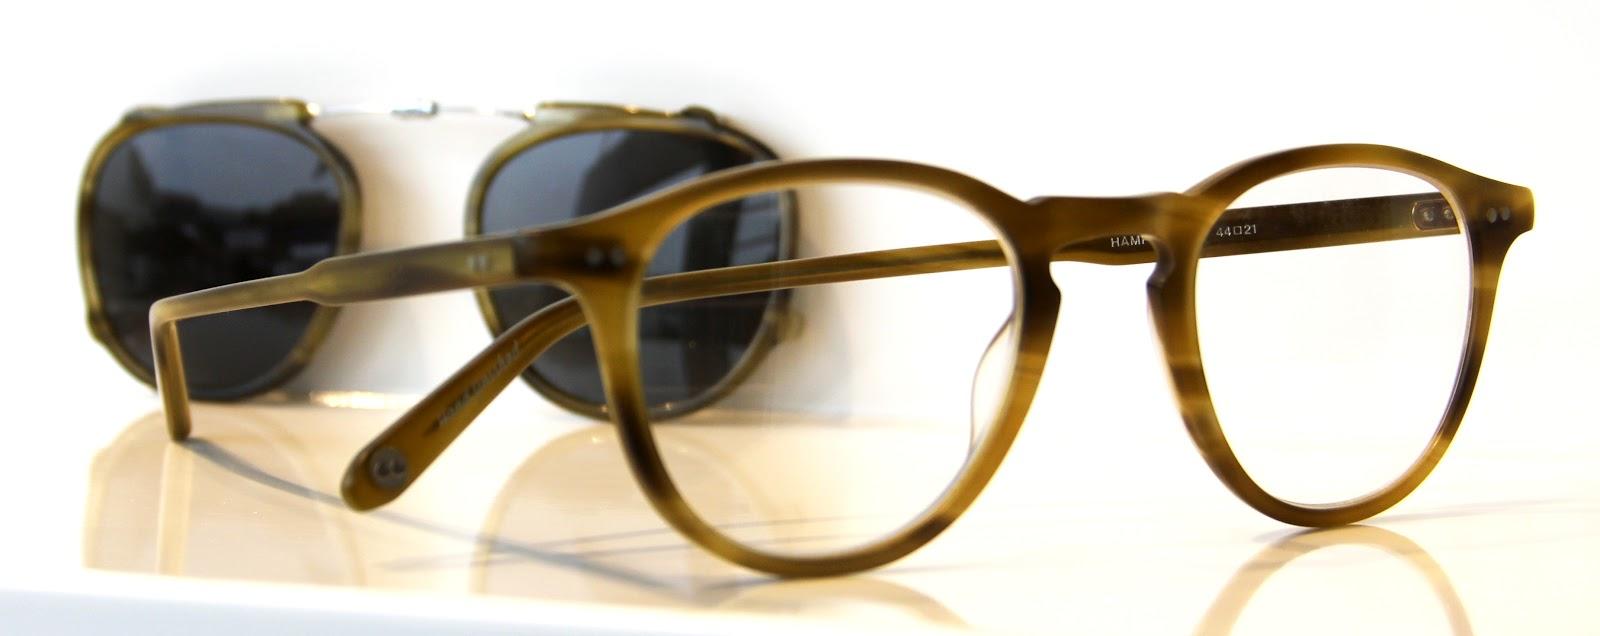 Michael Holmes Premium Eyewear: Garrett Leight California ...